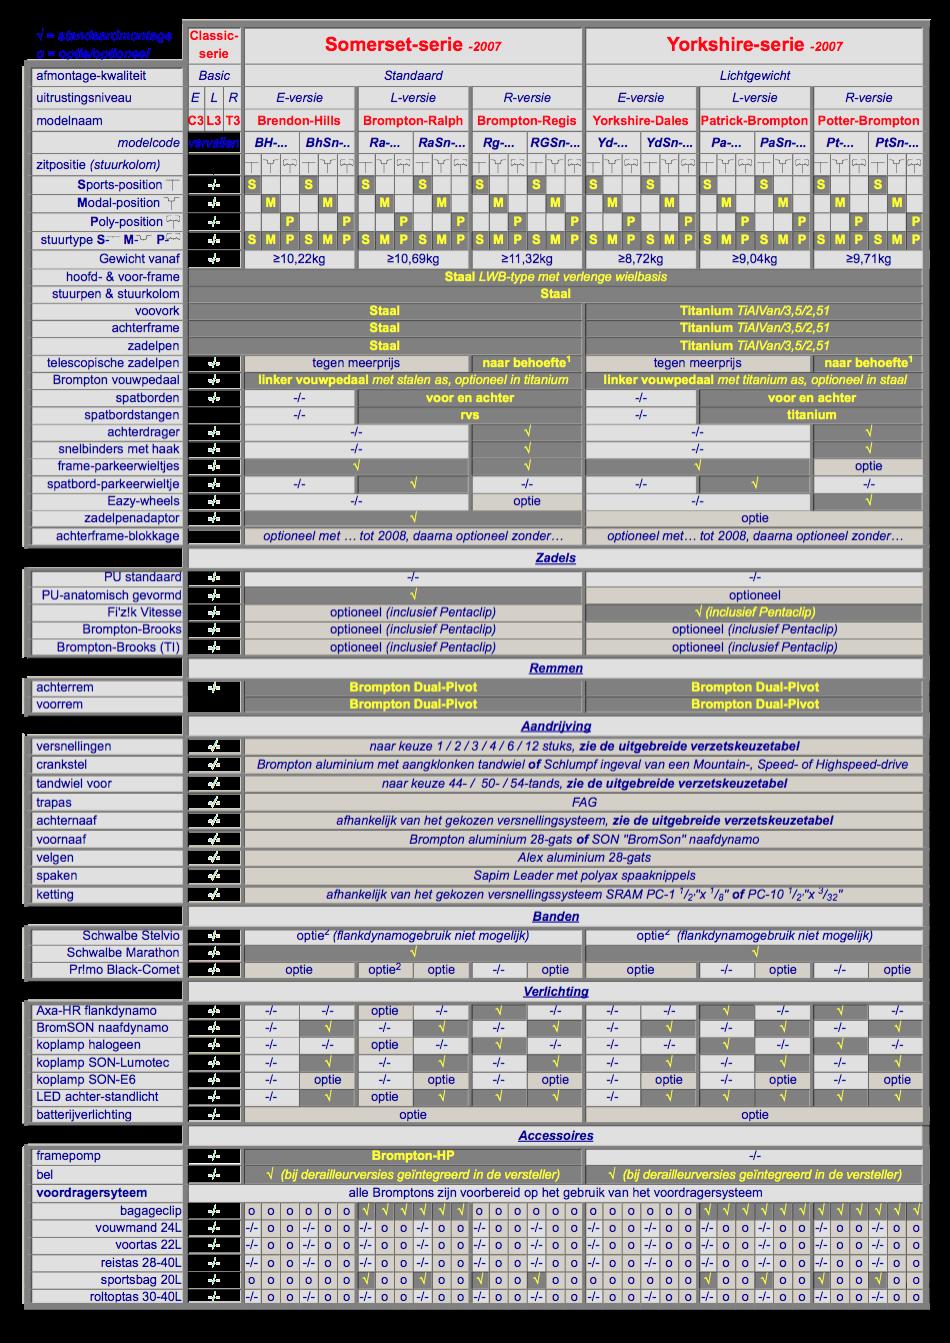 Tableau comparatif des Brompton - Page 2 Specificaties%20BNL%202007